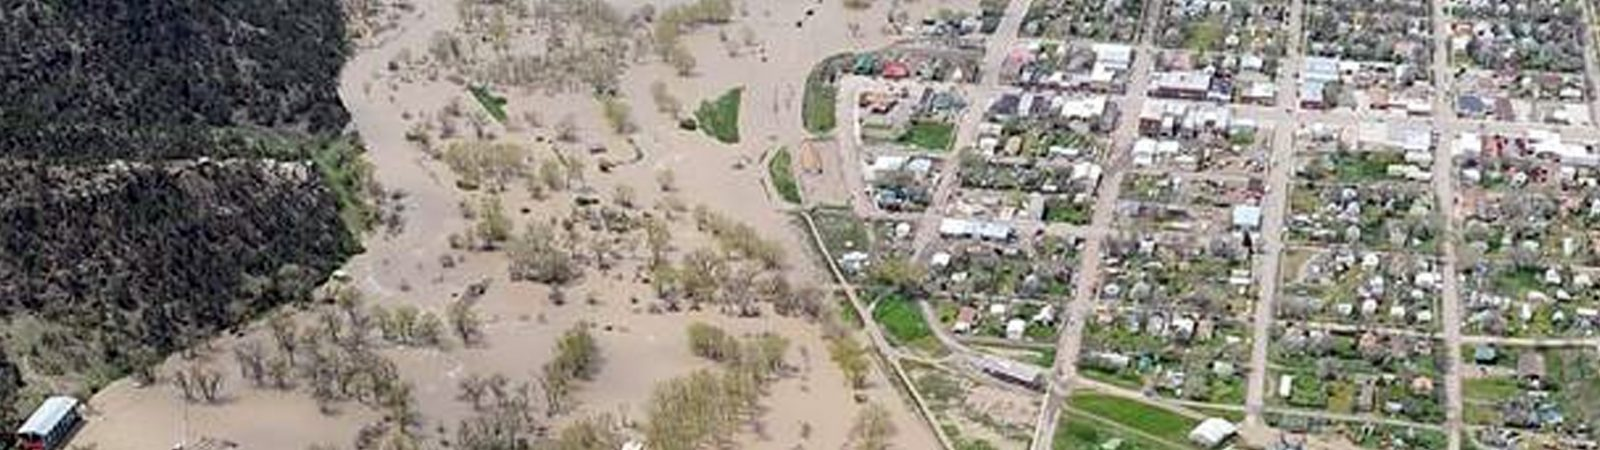 Roundup Flood 2011